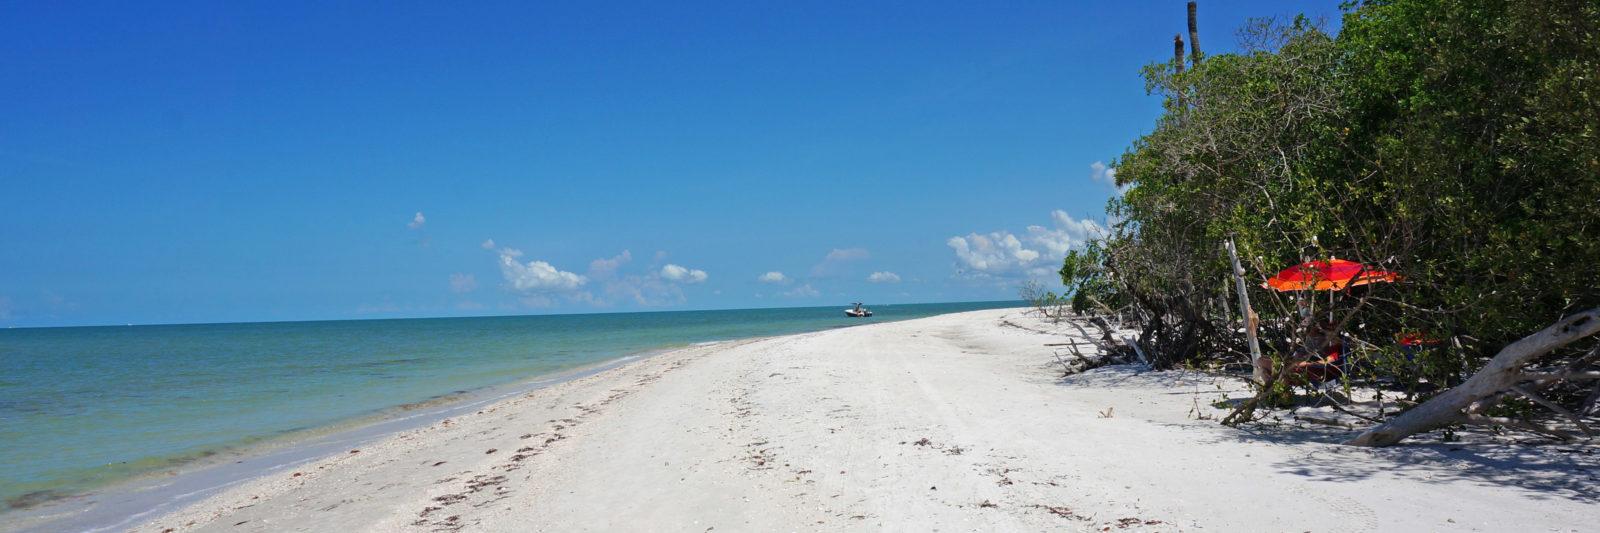 Naples Barefoot Beach